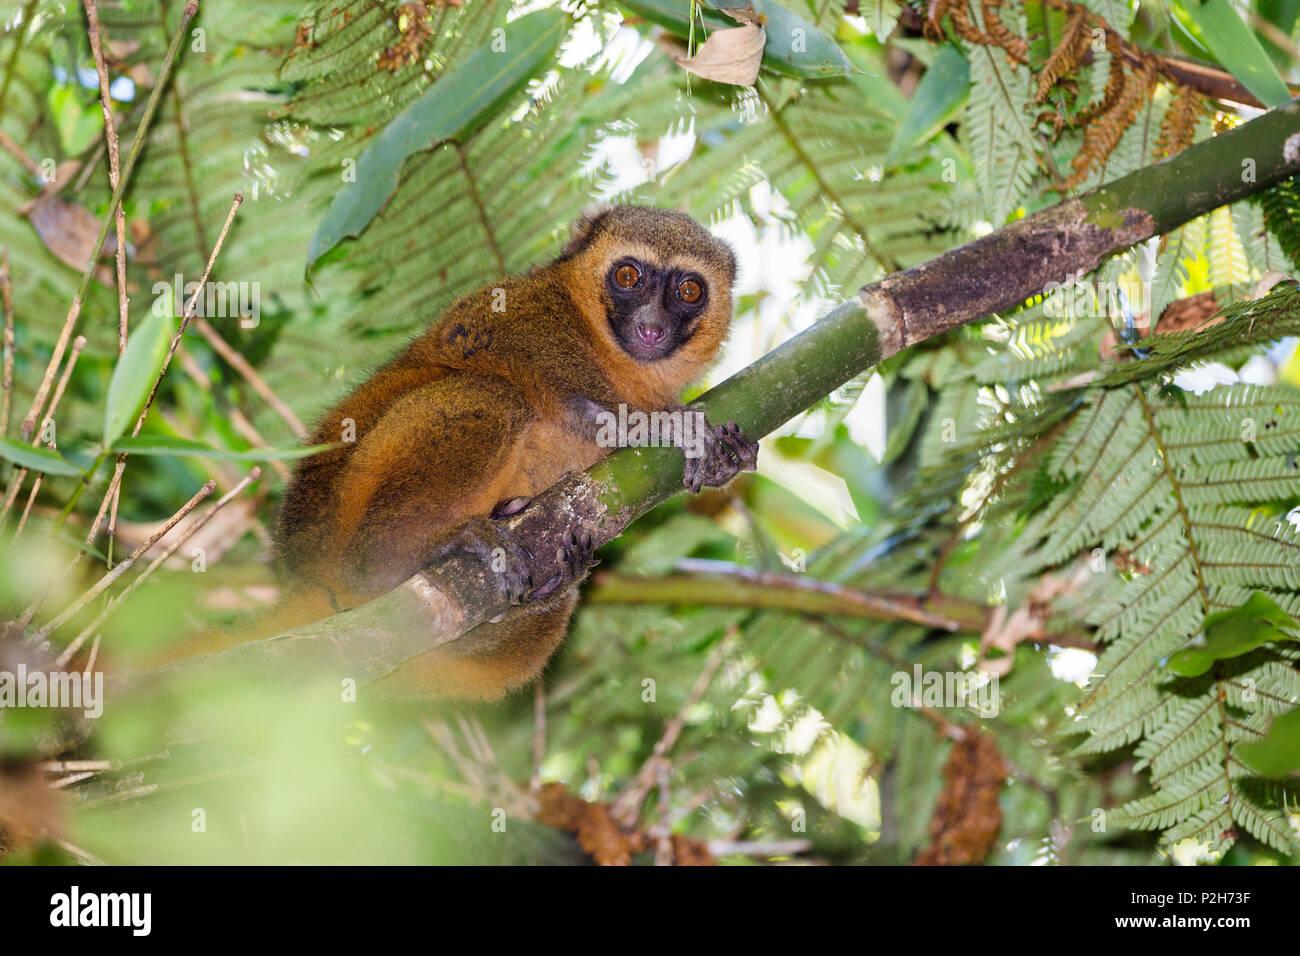 Golden Bamboo Lemur, rainforest of Ranomafana, Hapalemur aureus, Madagascar - Stock Image